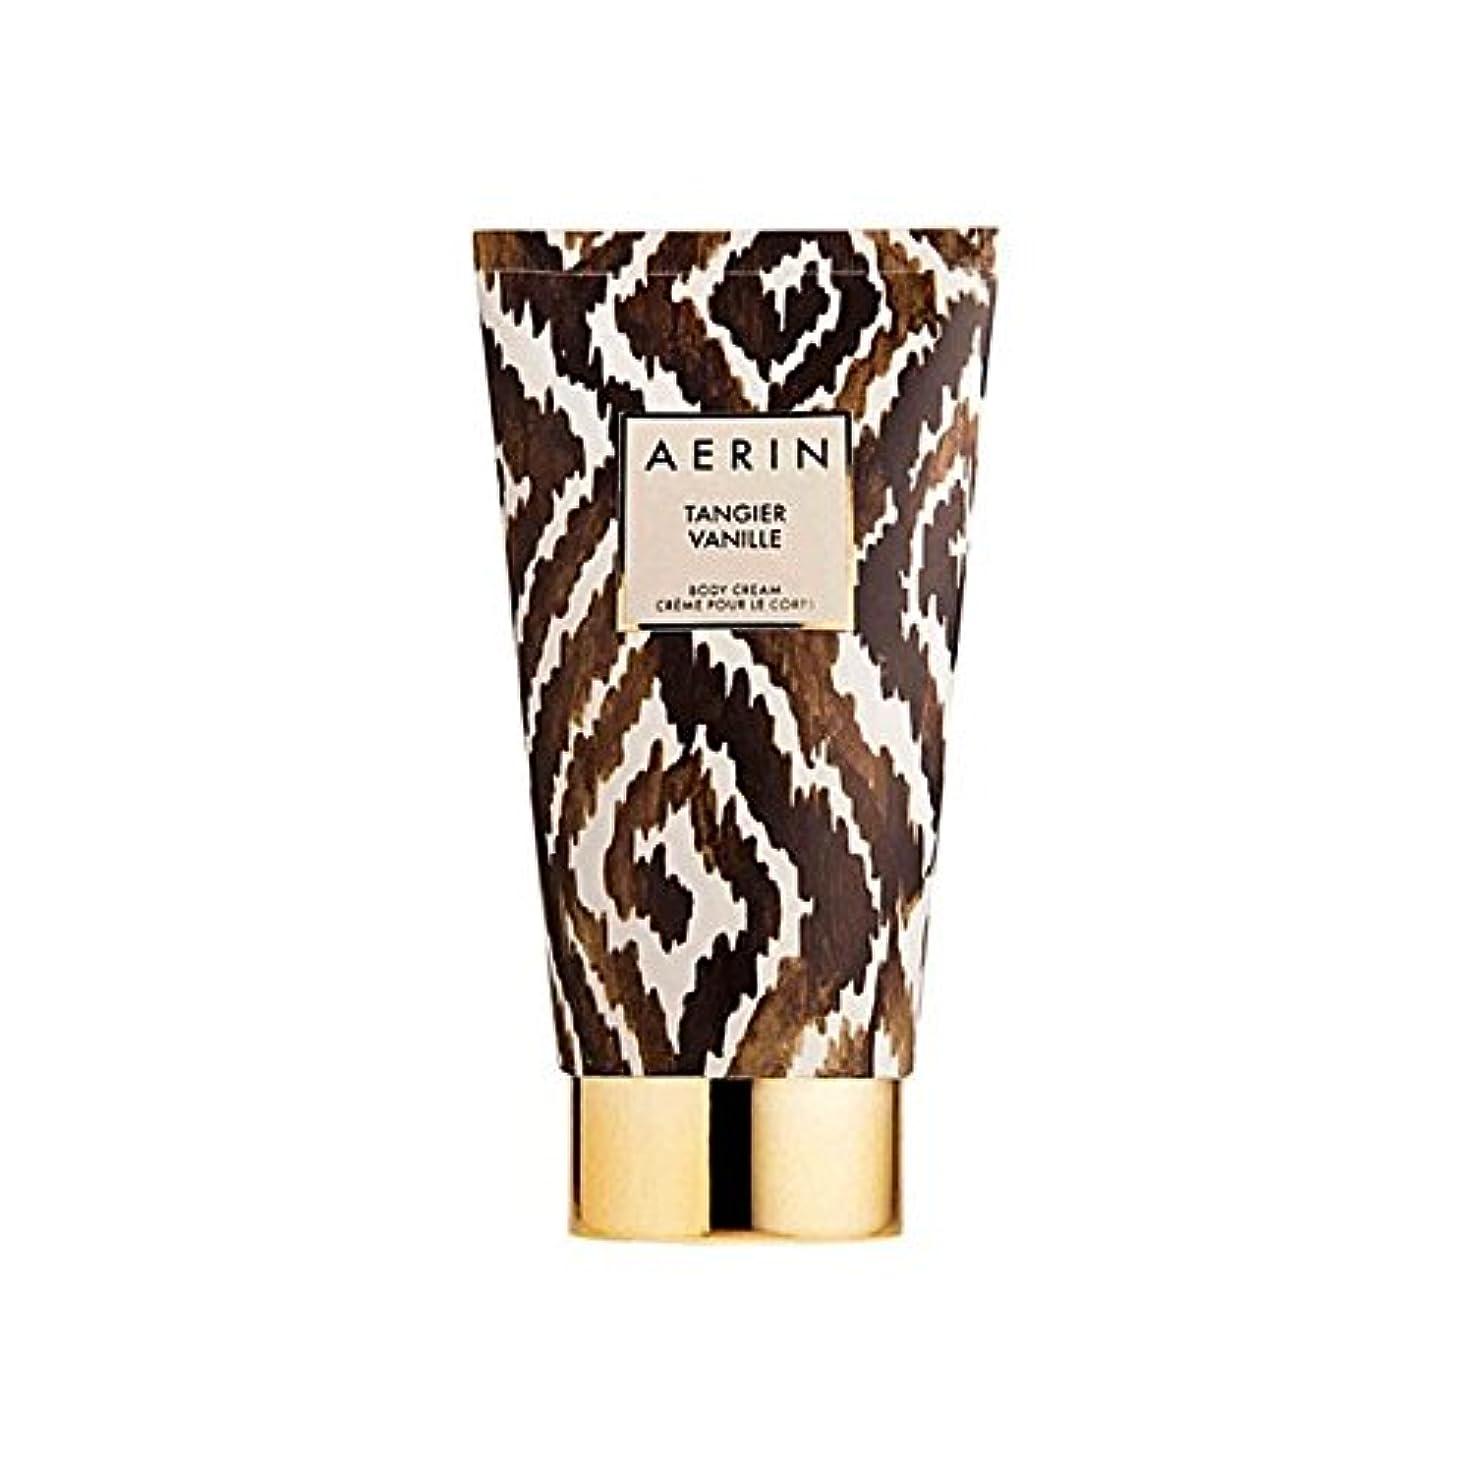 Aerin Tangier Vanille Body Cream (Pack of 6) - タンジールヴァニラボディクリーム x6 [並行輸入品]